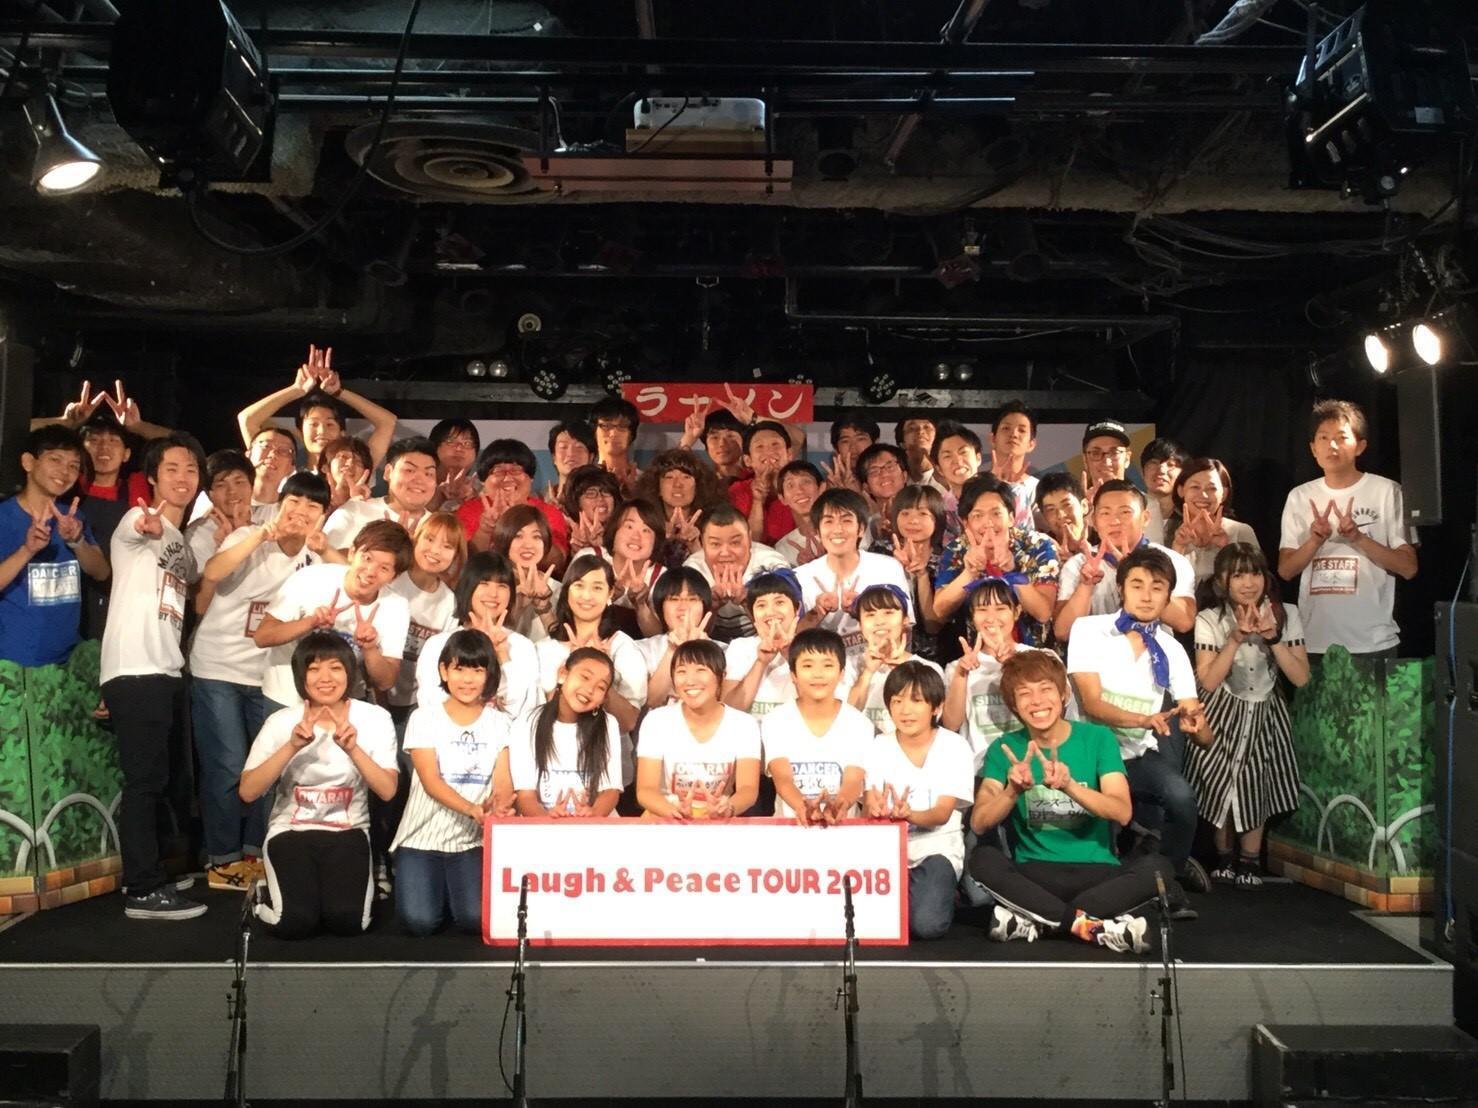 http://news.yoshimoto.co.jp/20181006174257-3f4a842ac65444d17f2aba60993a27cbe08c7e93.jpg